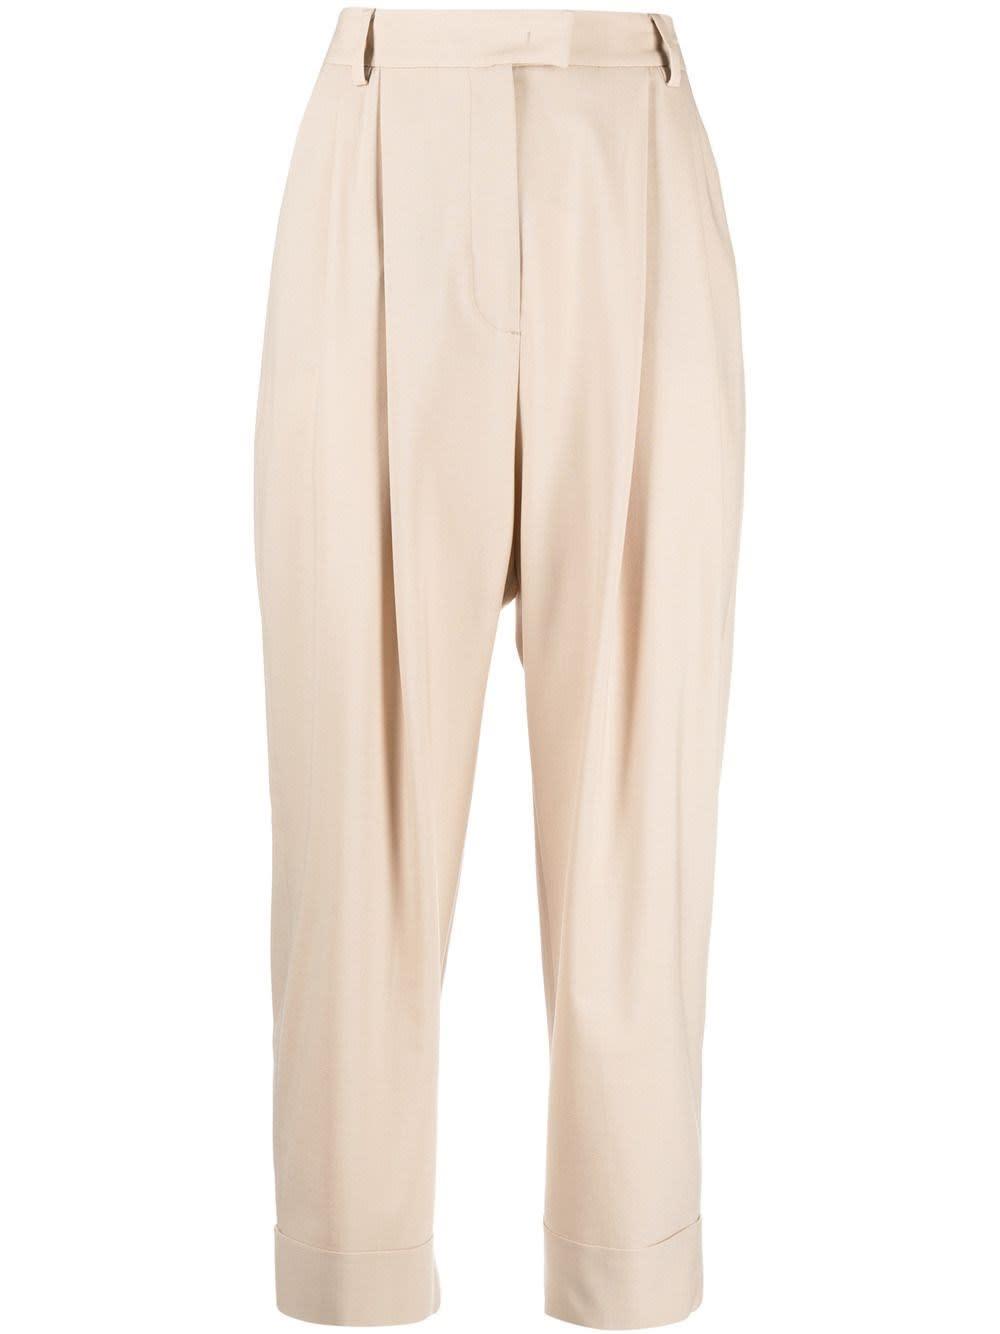 Pt01 Straight pants BEIGE WOOL BLEND TROUSERS